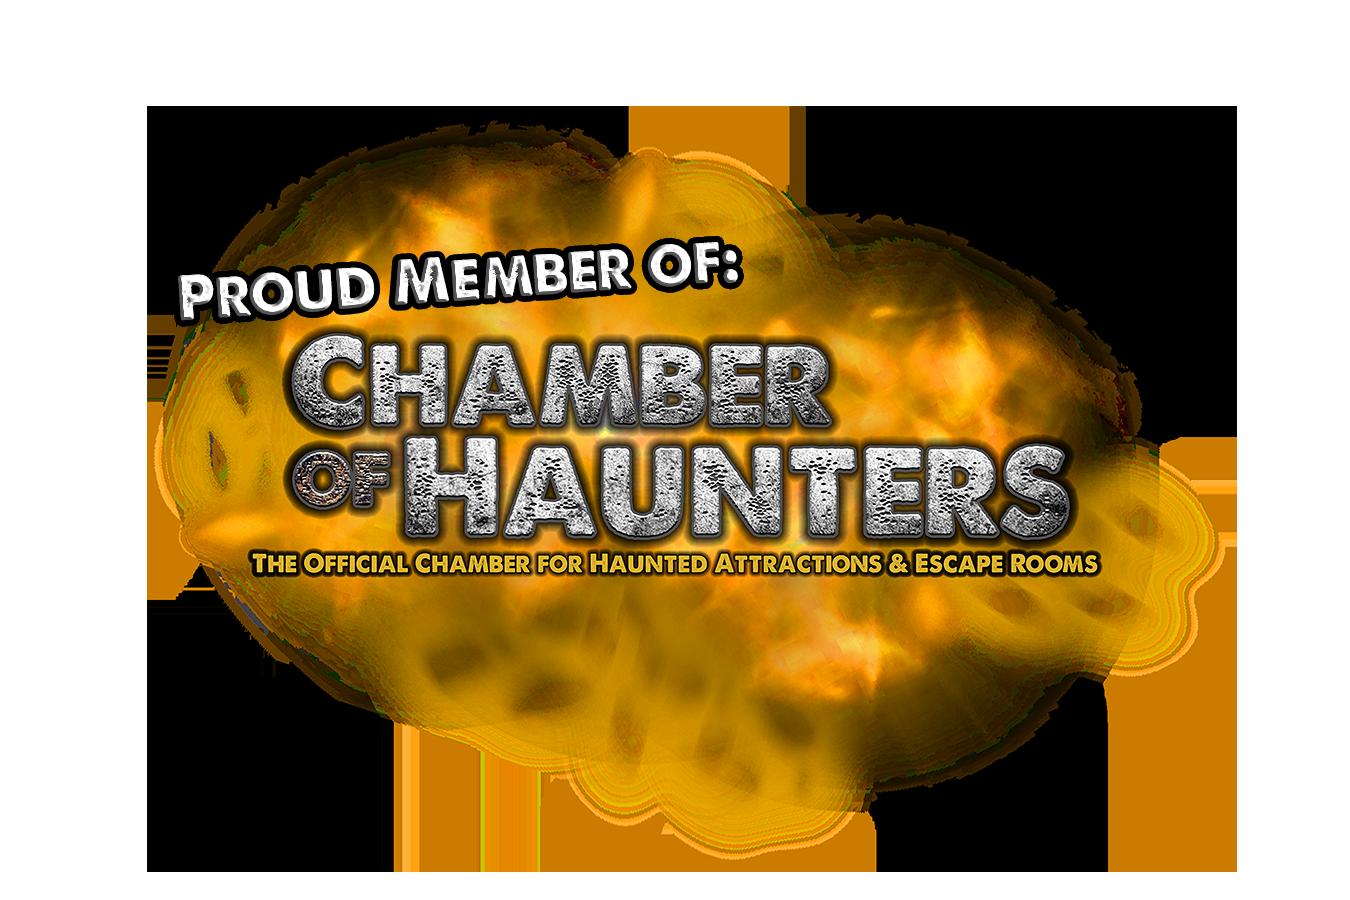 Chamber of Haunters Member